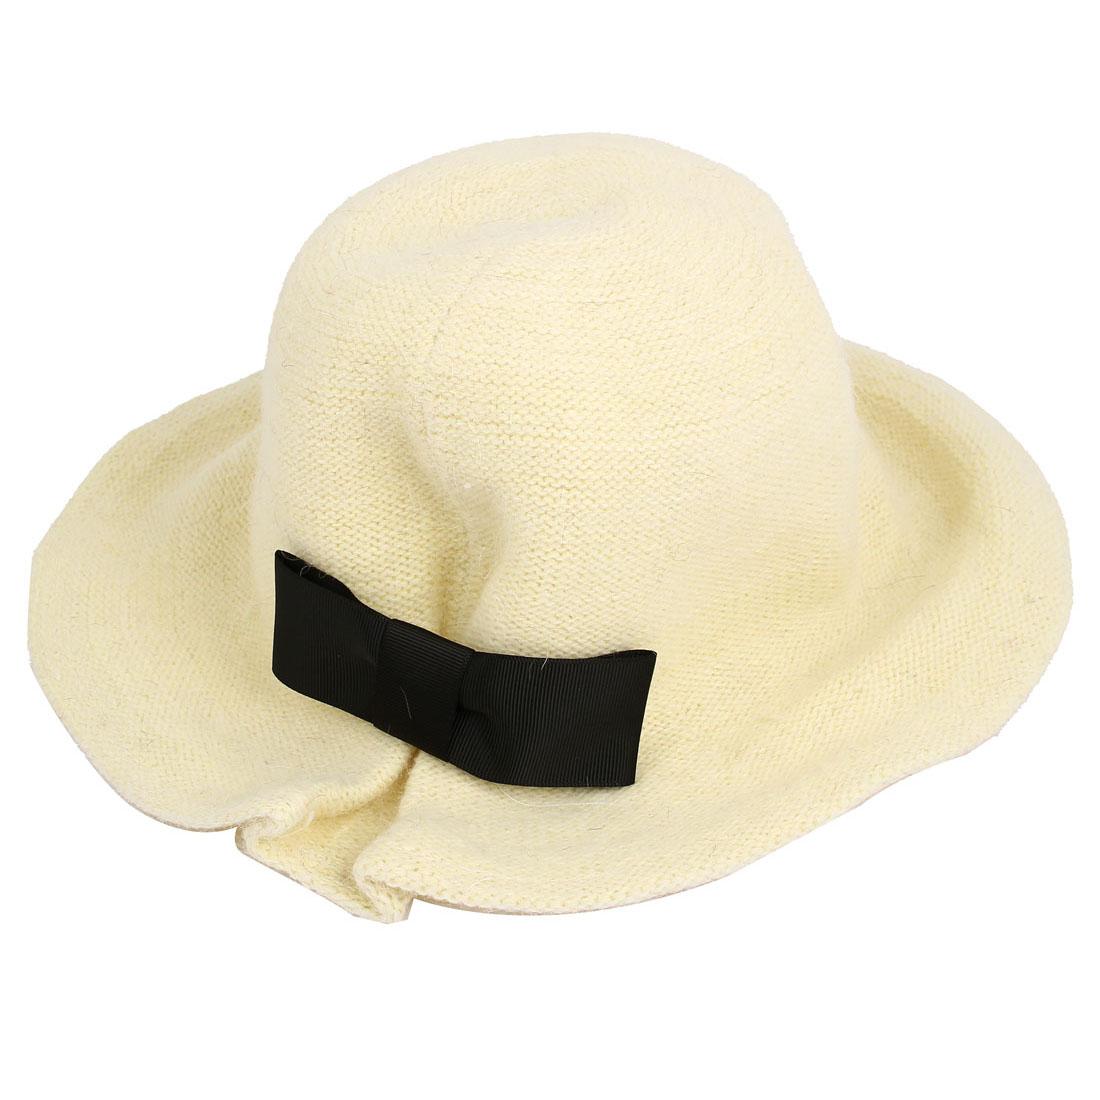 Lady Faux Fur Bowknot Decor Party Winter Bowler Cloche Bucket Hat Cap Off White